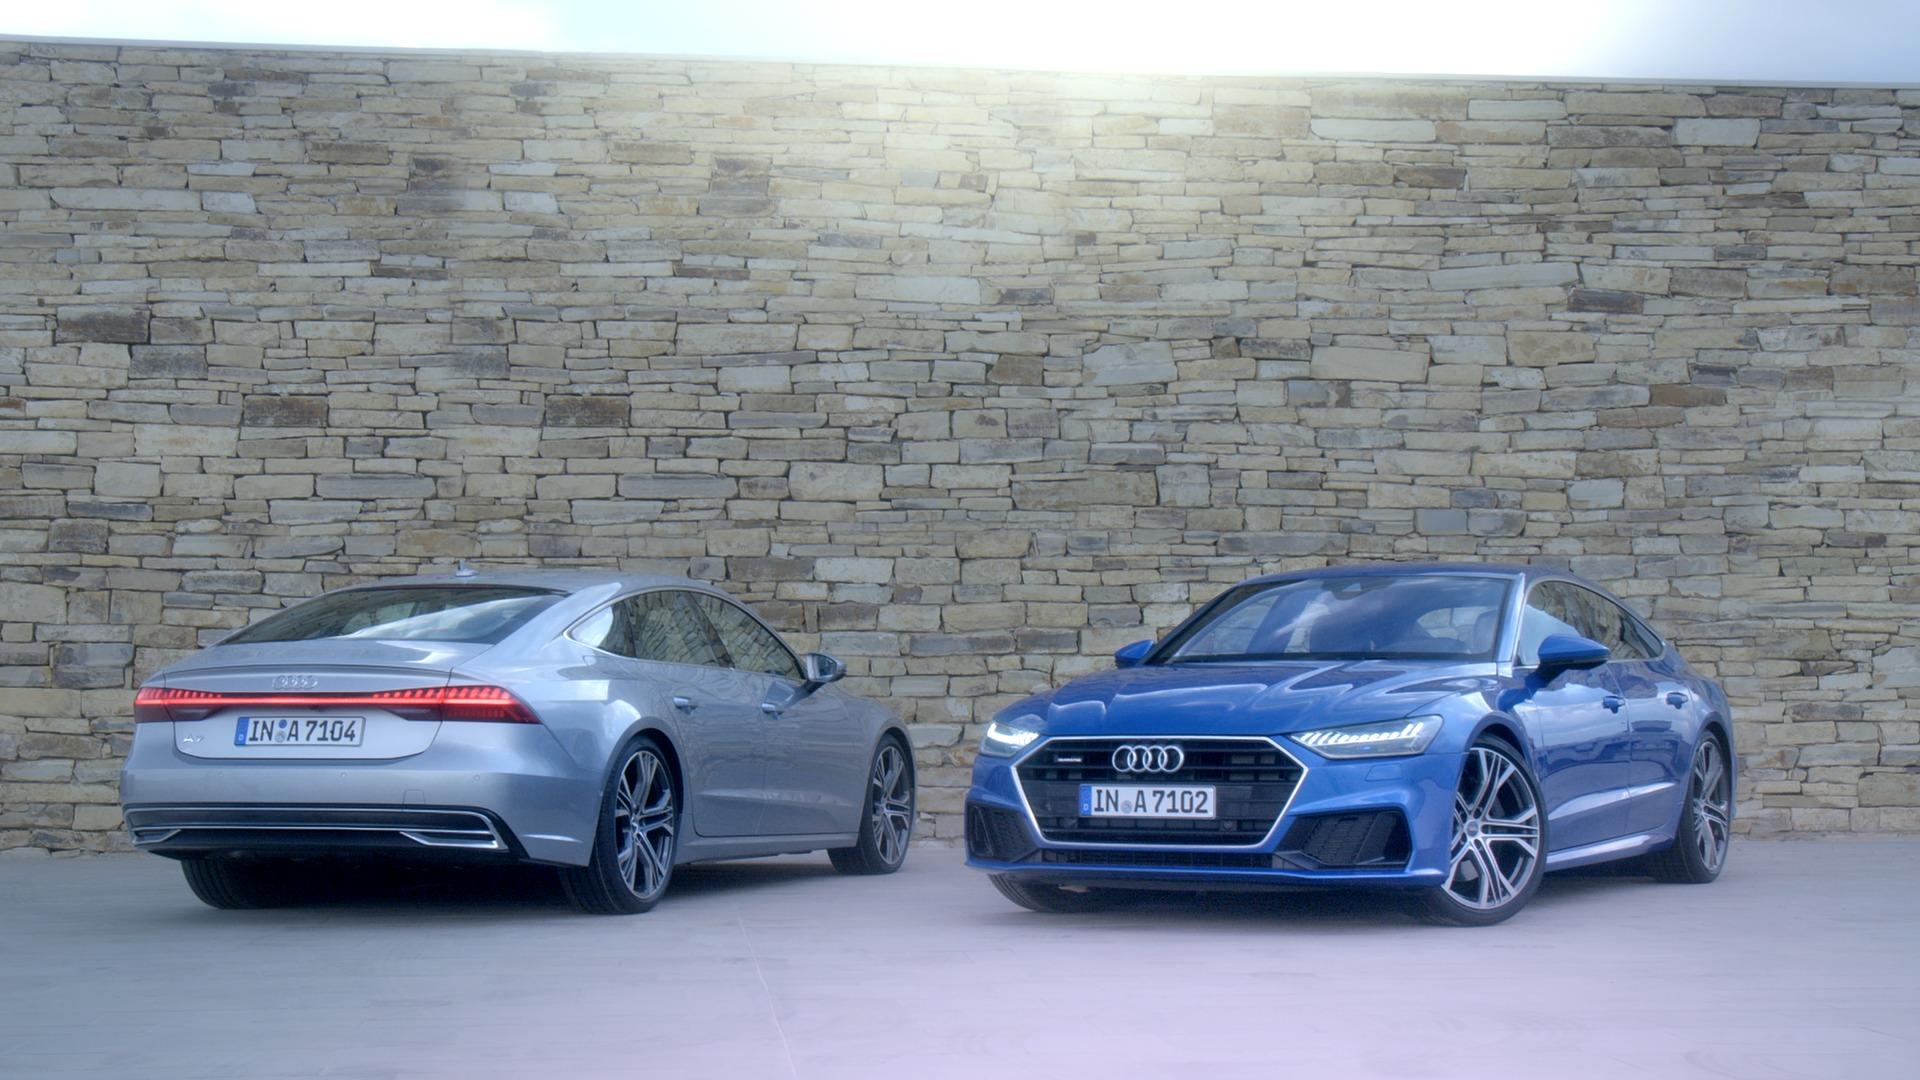 Der neue Audi A7 Sportback